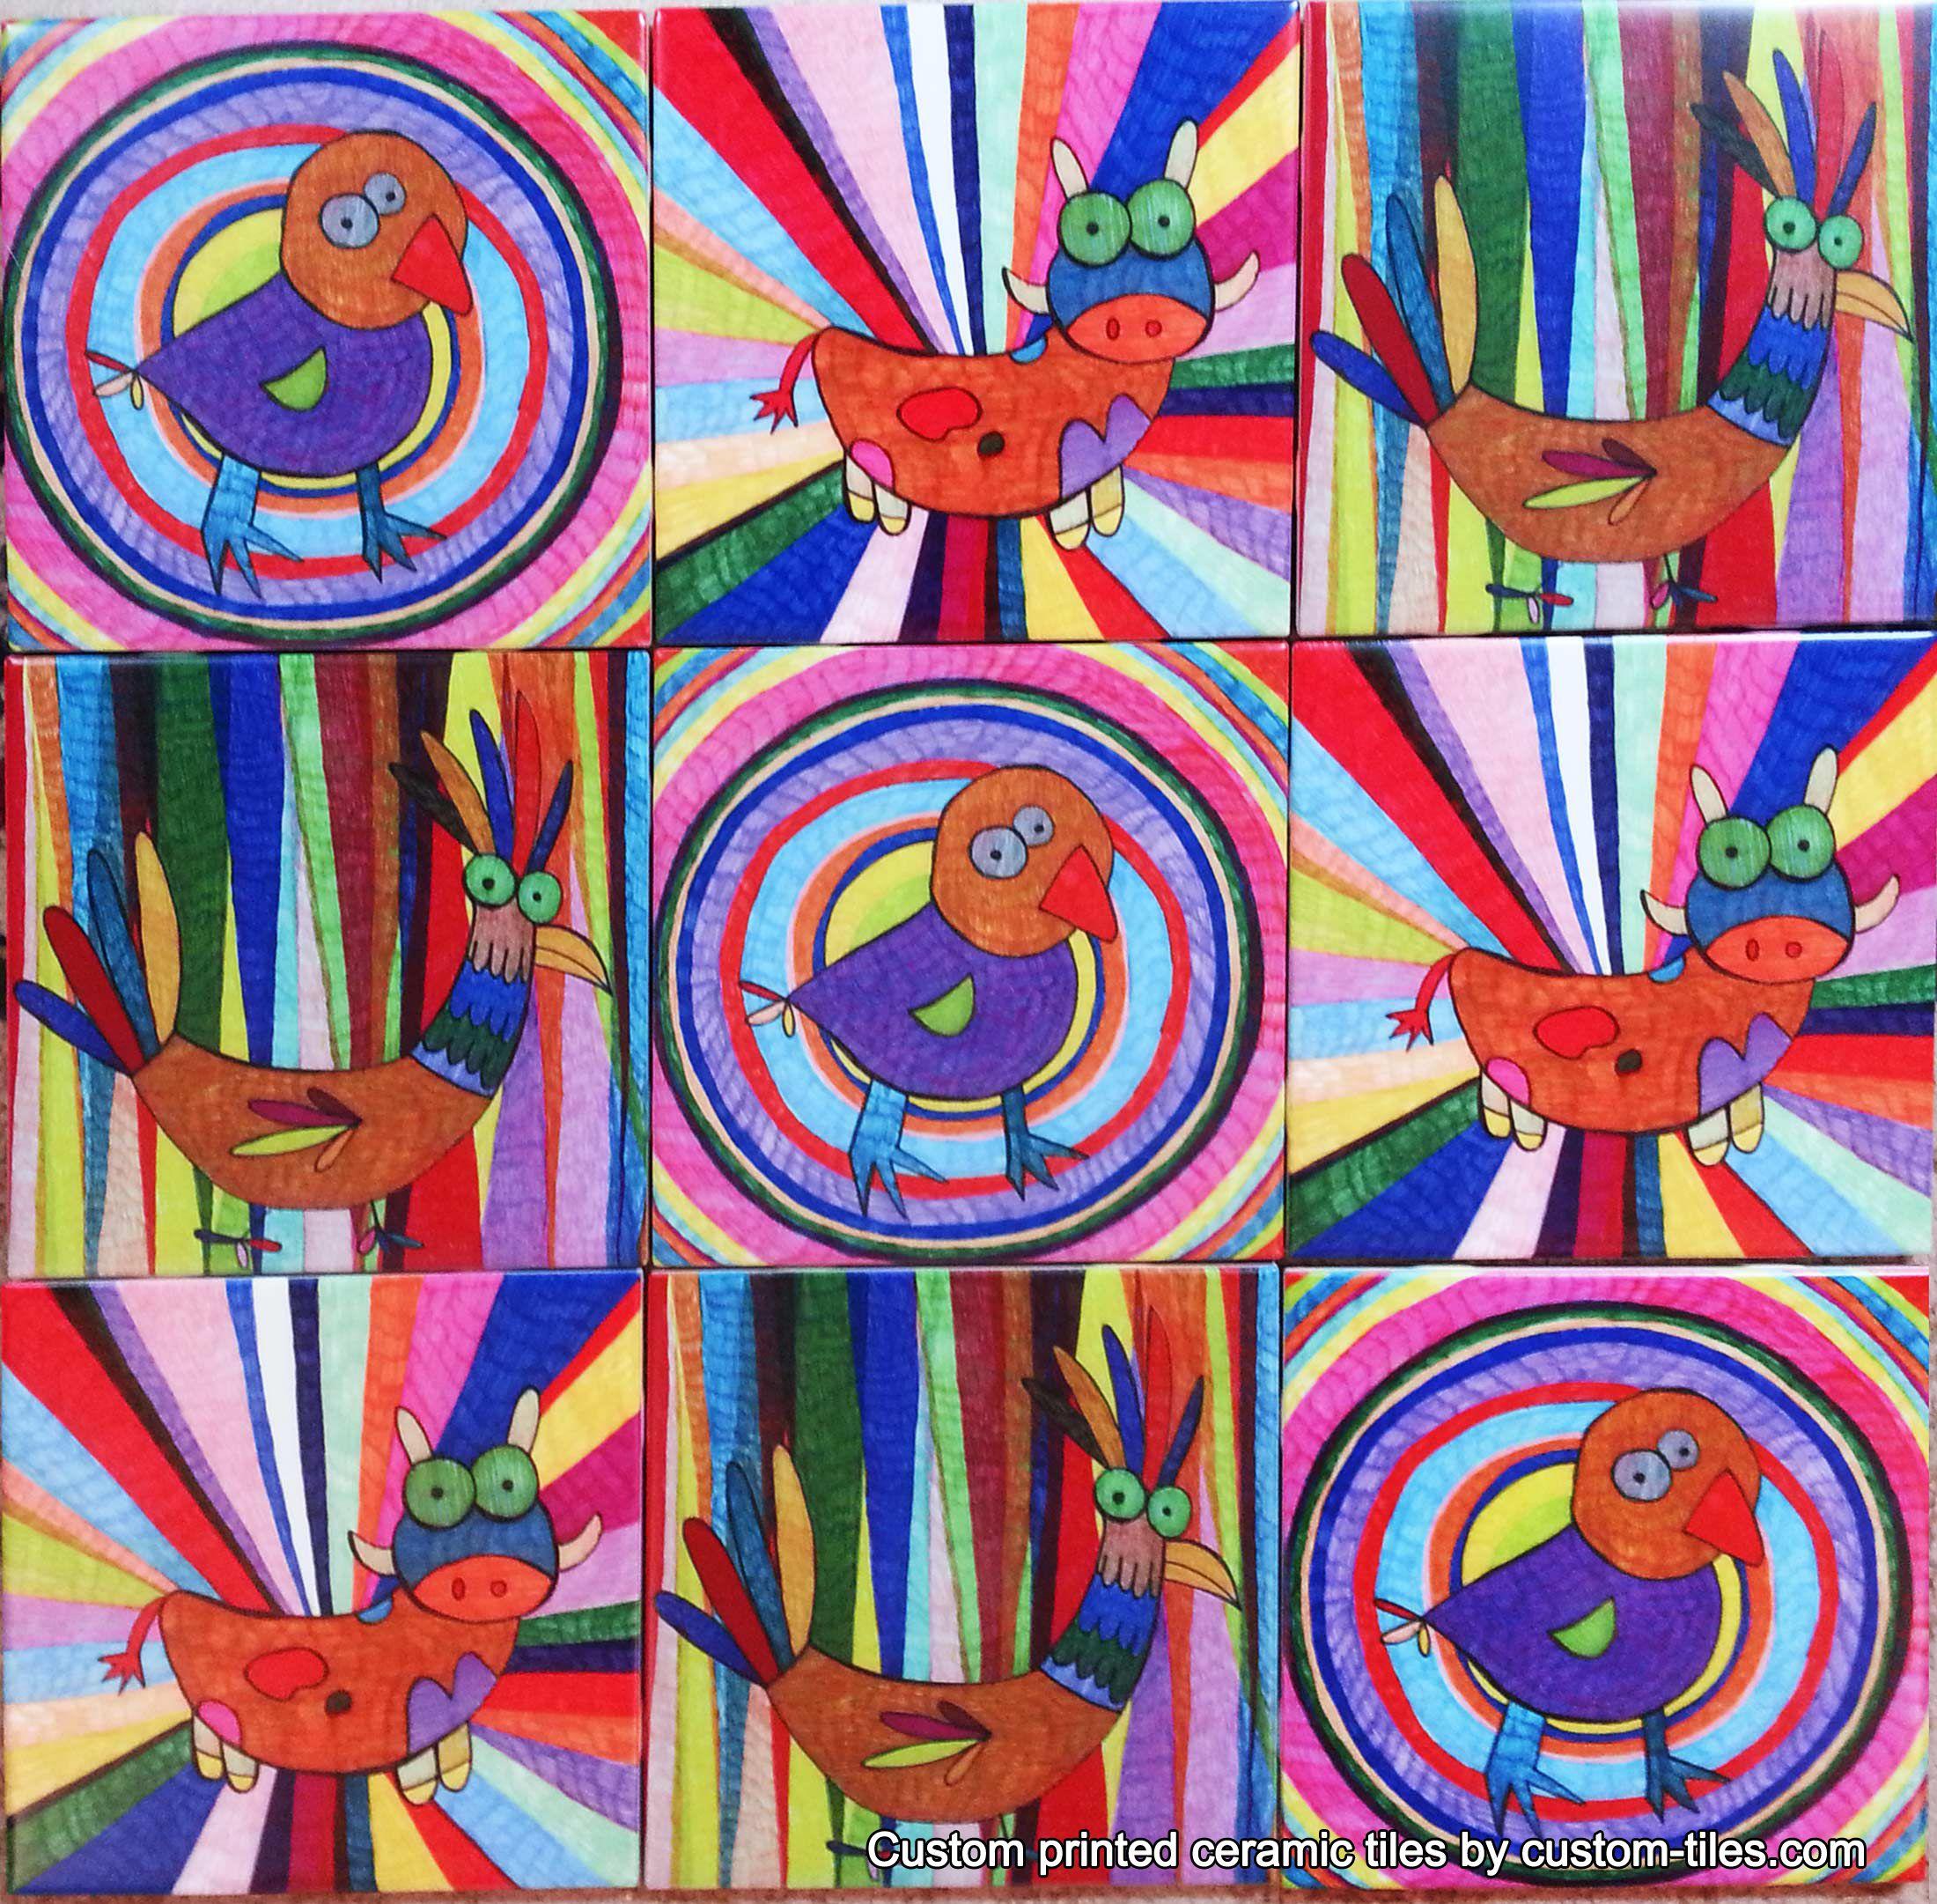 Artistic sketches colorful farm animals custom printed on artistic sketches colorful farm animals custom printed on ceramic tile for wall murals dailygadgetfo Gallery